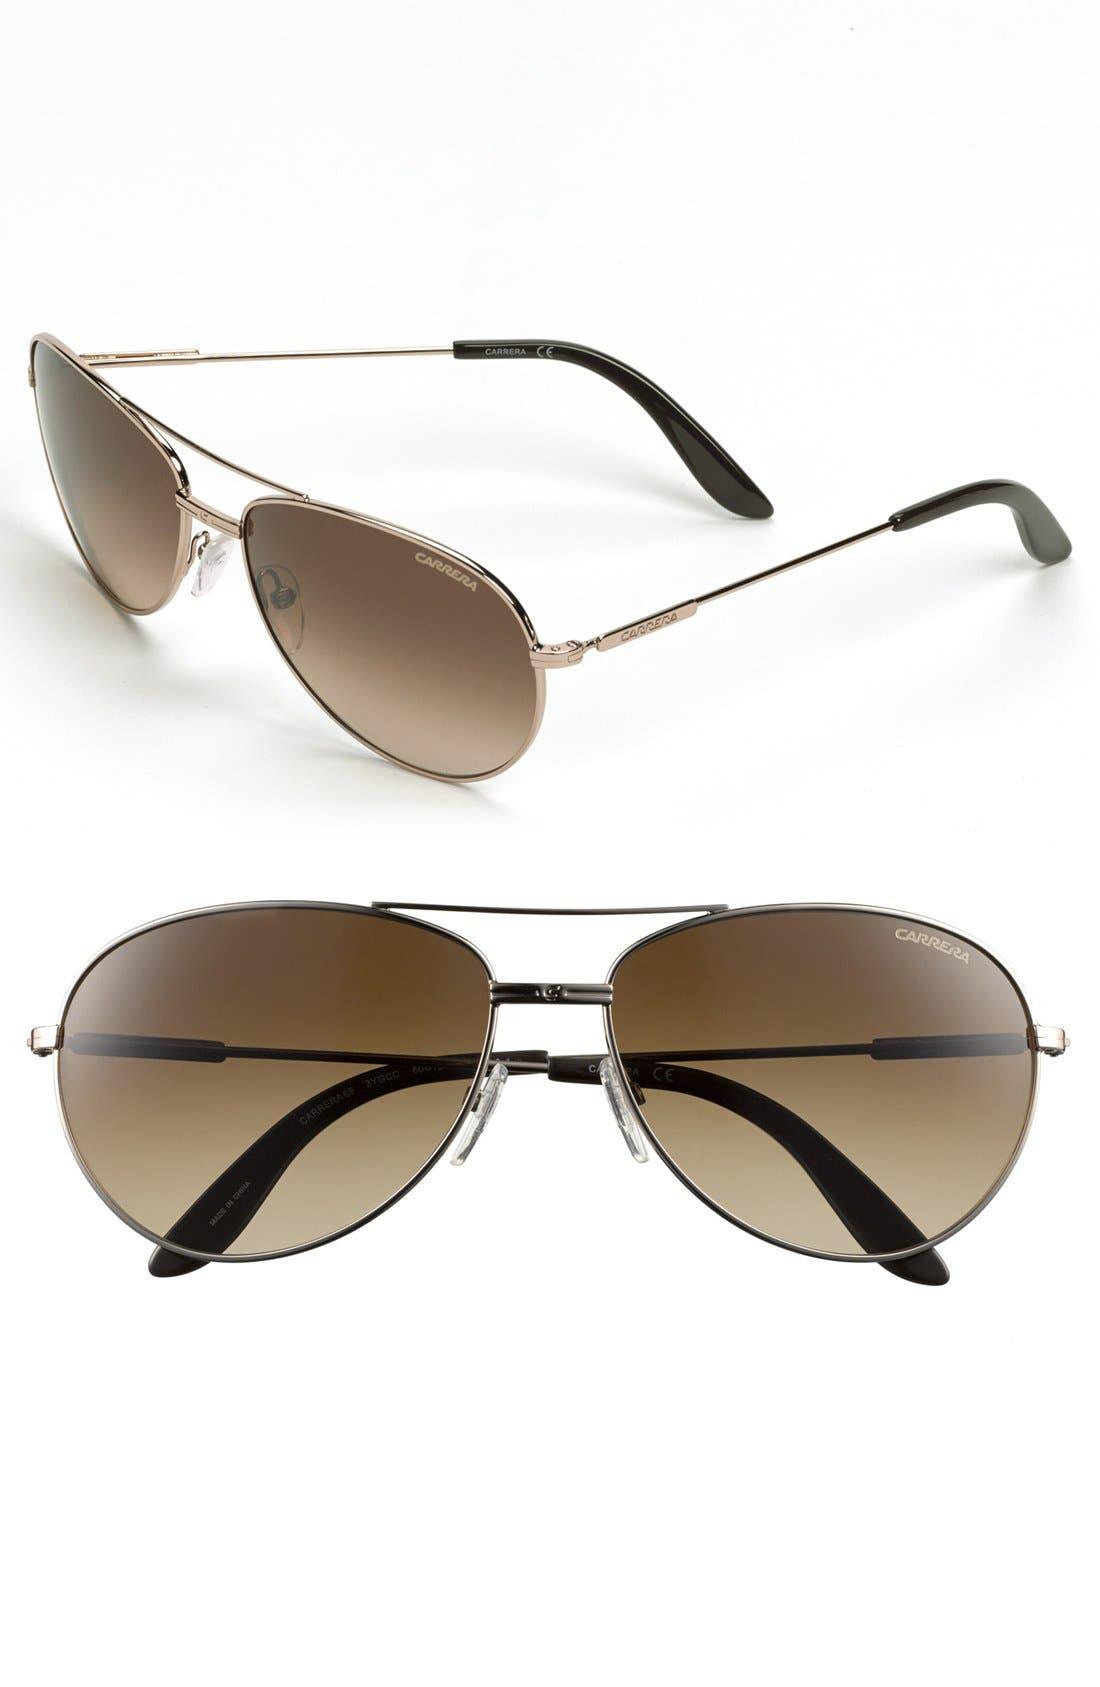 Alternate Image 1 Selected - Carrera Eyewear '69/S' 60mm Sunglasses